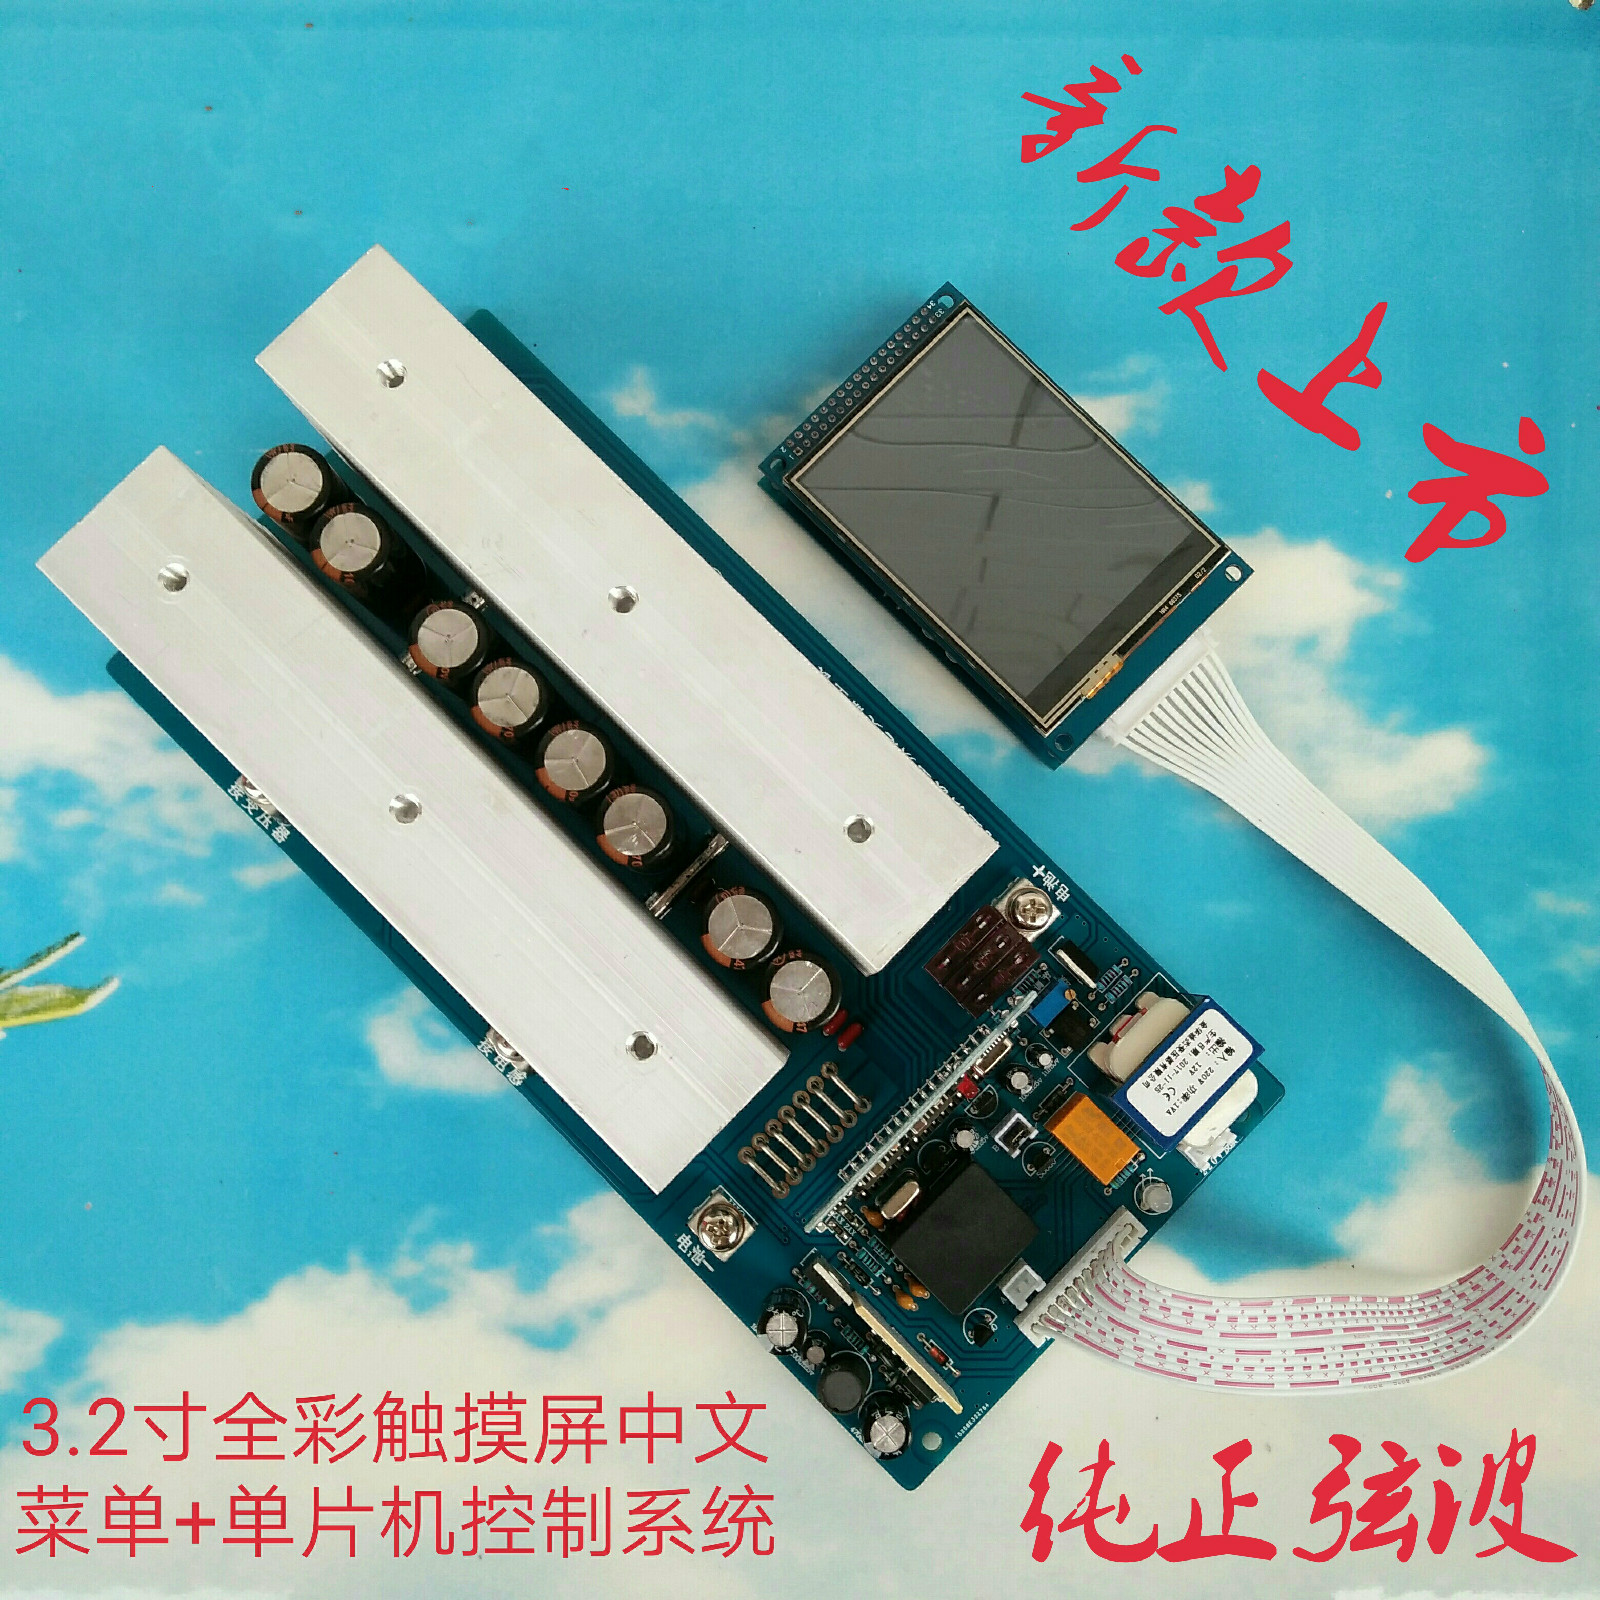 все цены на New MCU + Touch-screen LCD Pure Sine Wave Power Frequency Inverter Main Board 48V/60V5 Kw онлайн